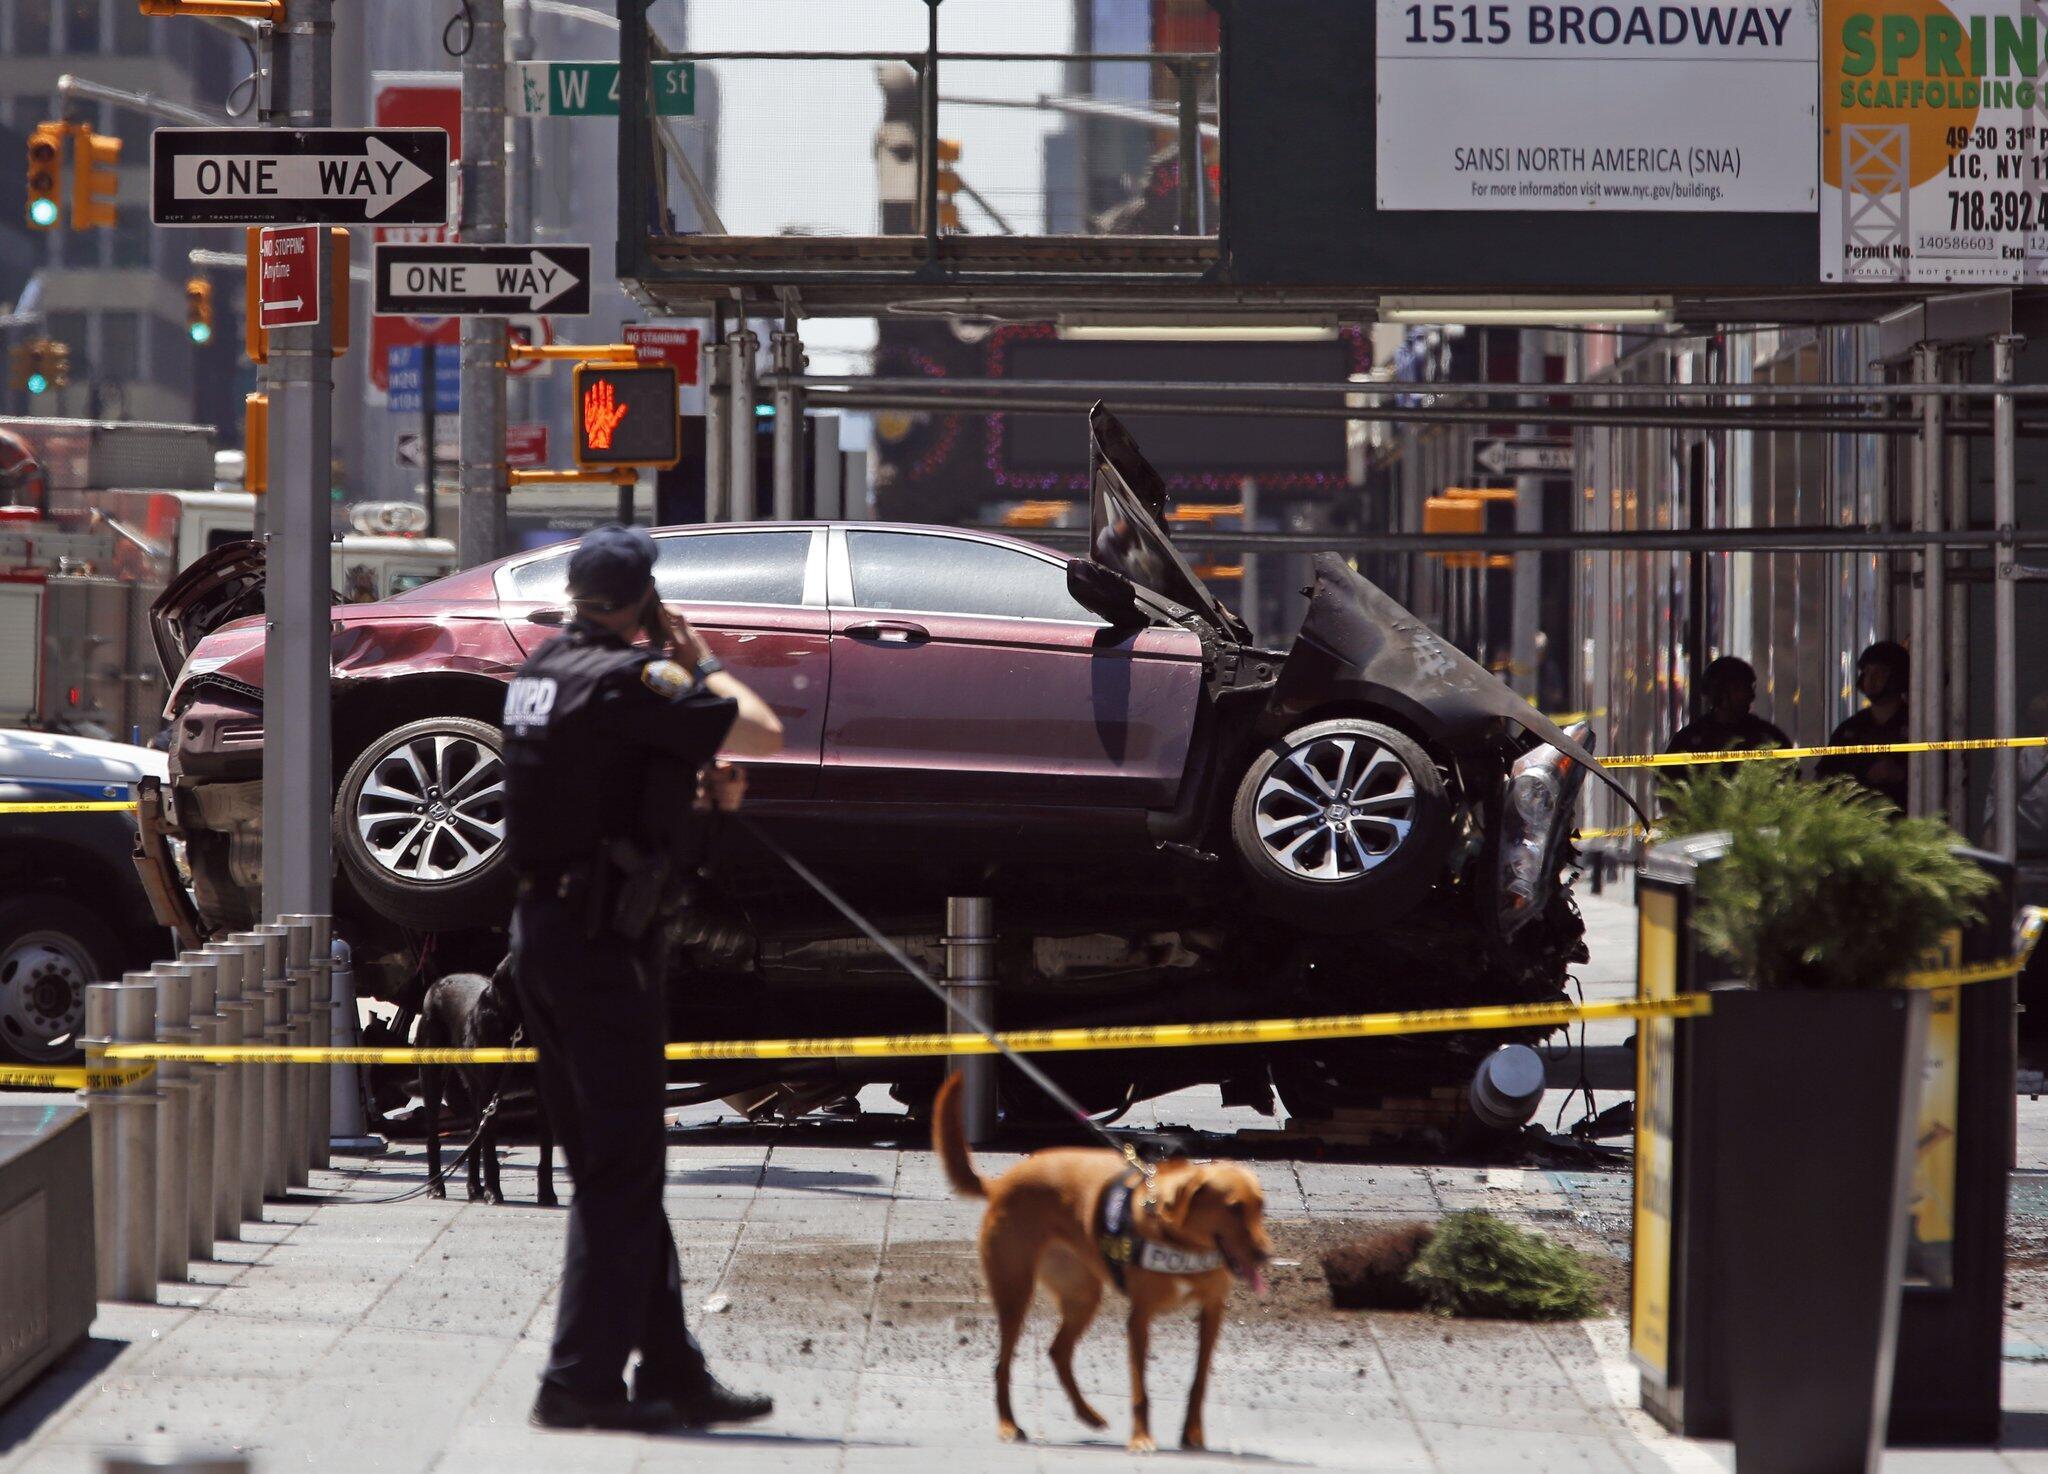 Image Times Square driver bollards